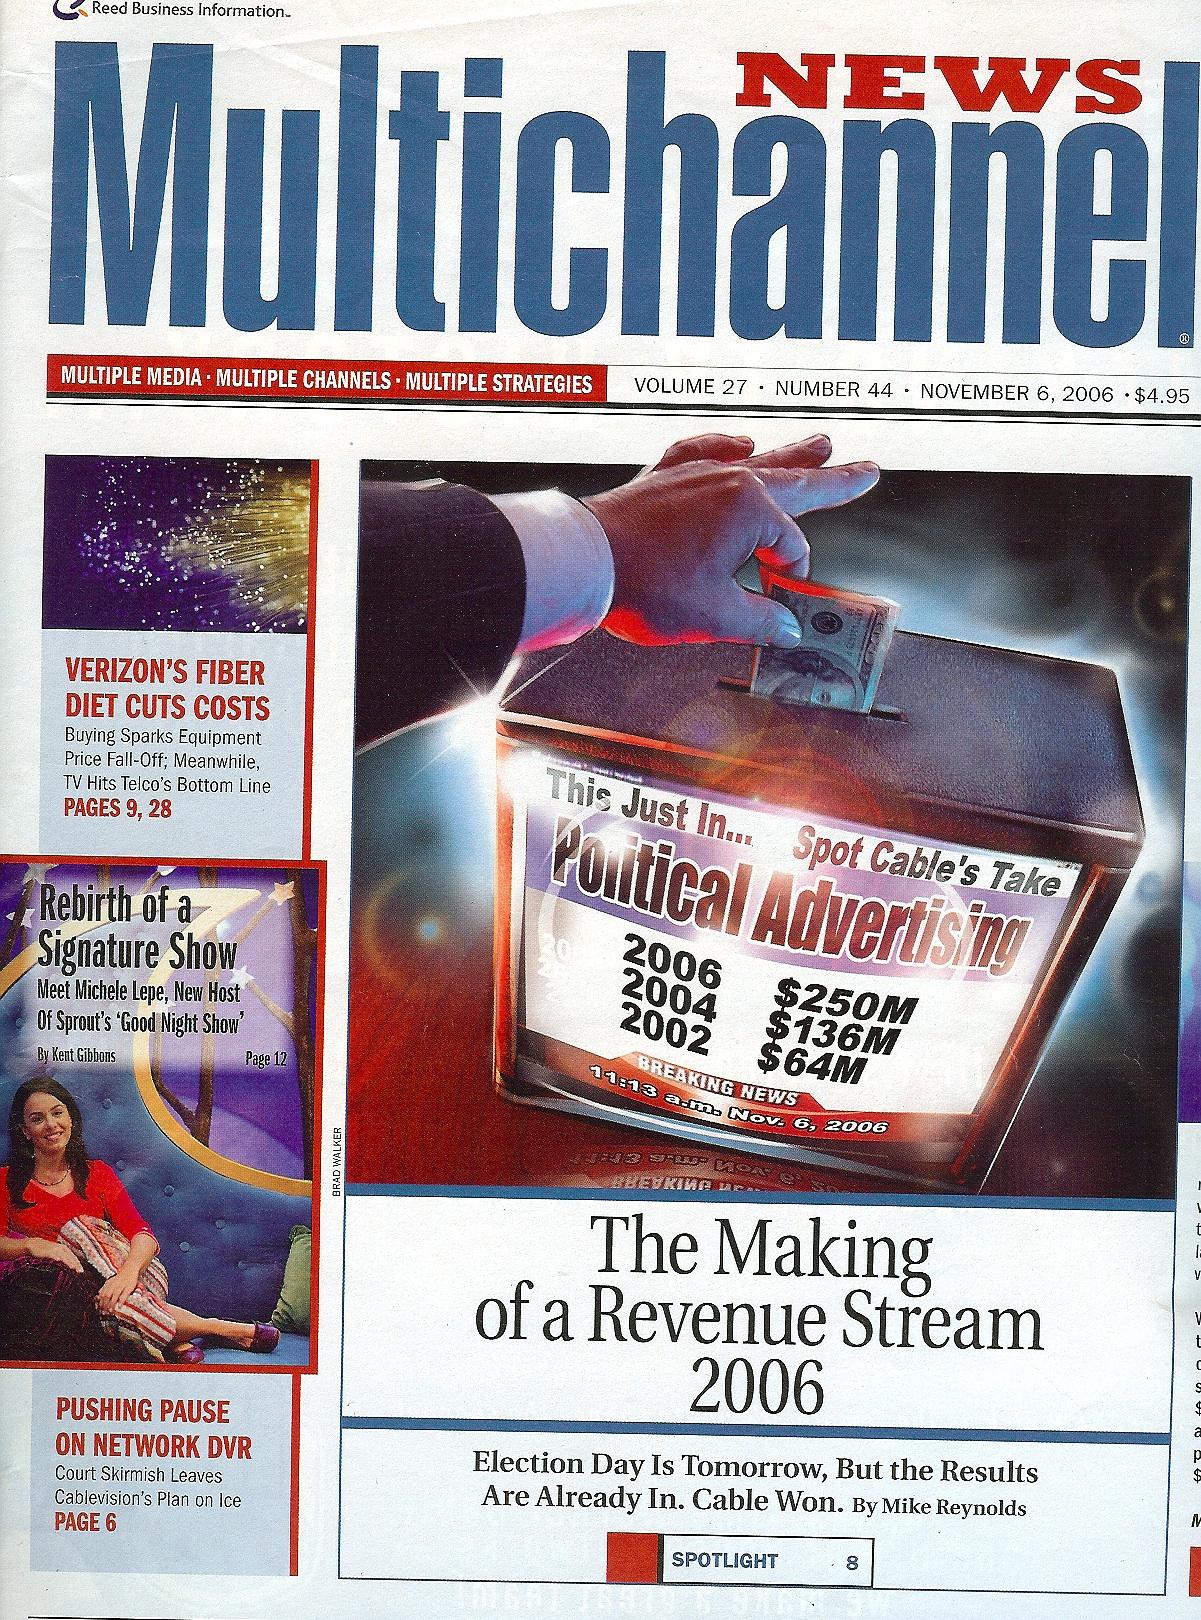 Multichannel-news-article-p1.jpg